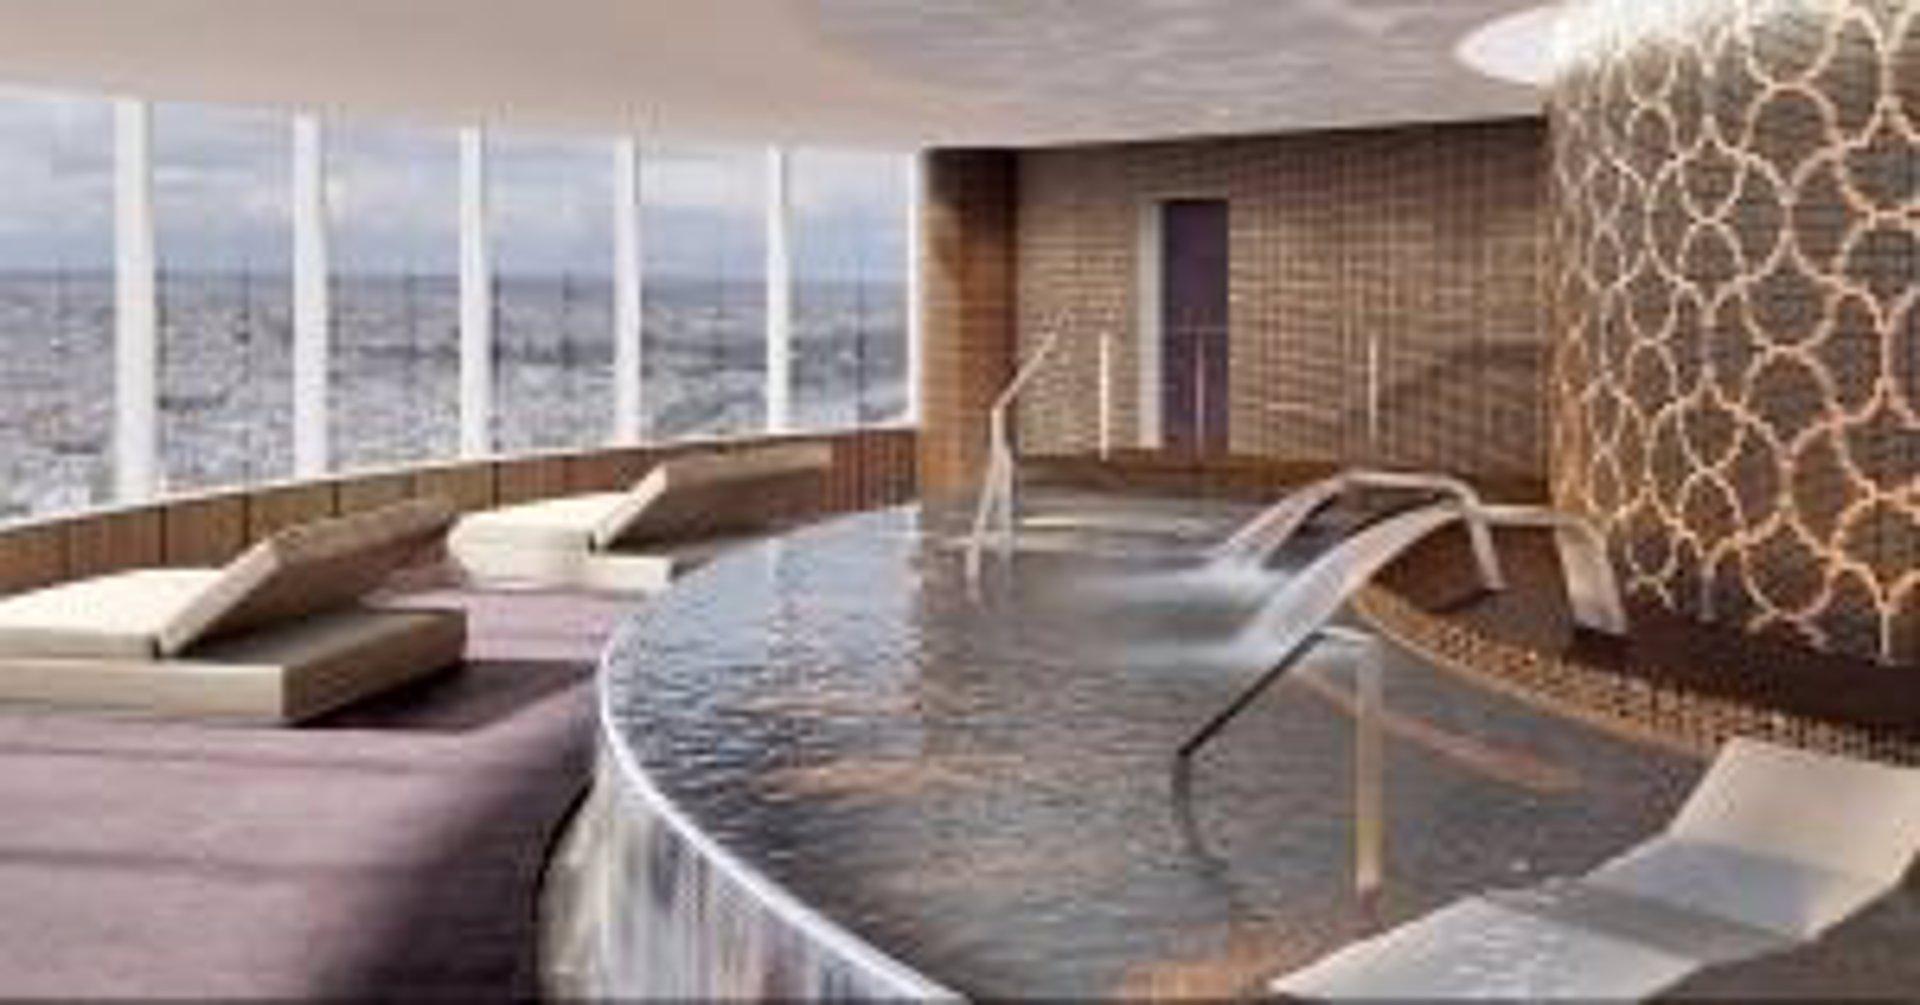 El hotel eurostars de torre sevilla tendr spa en la planta 35 - Spa de sevilla ...